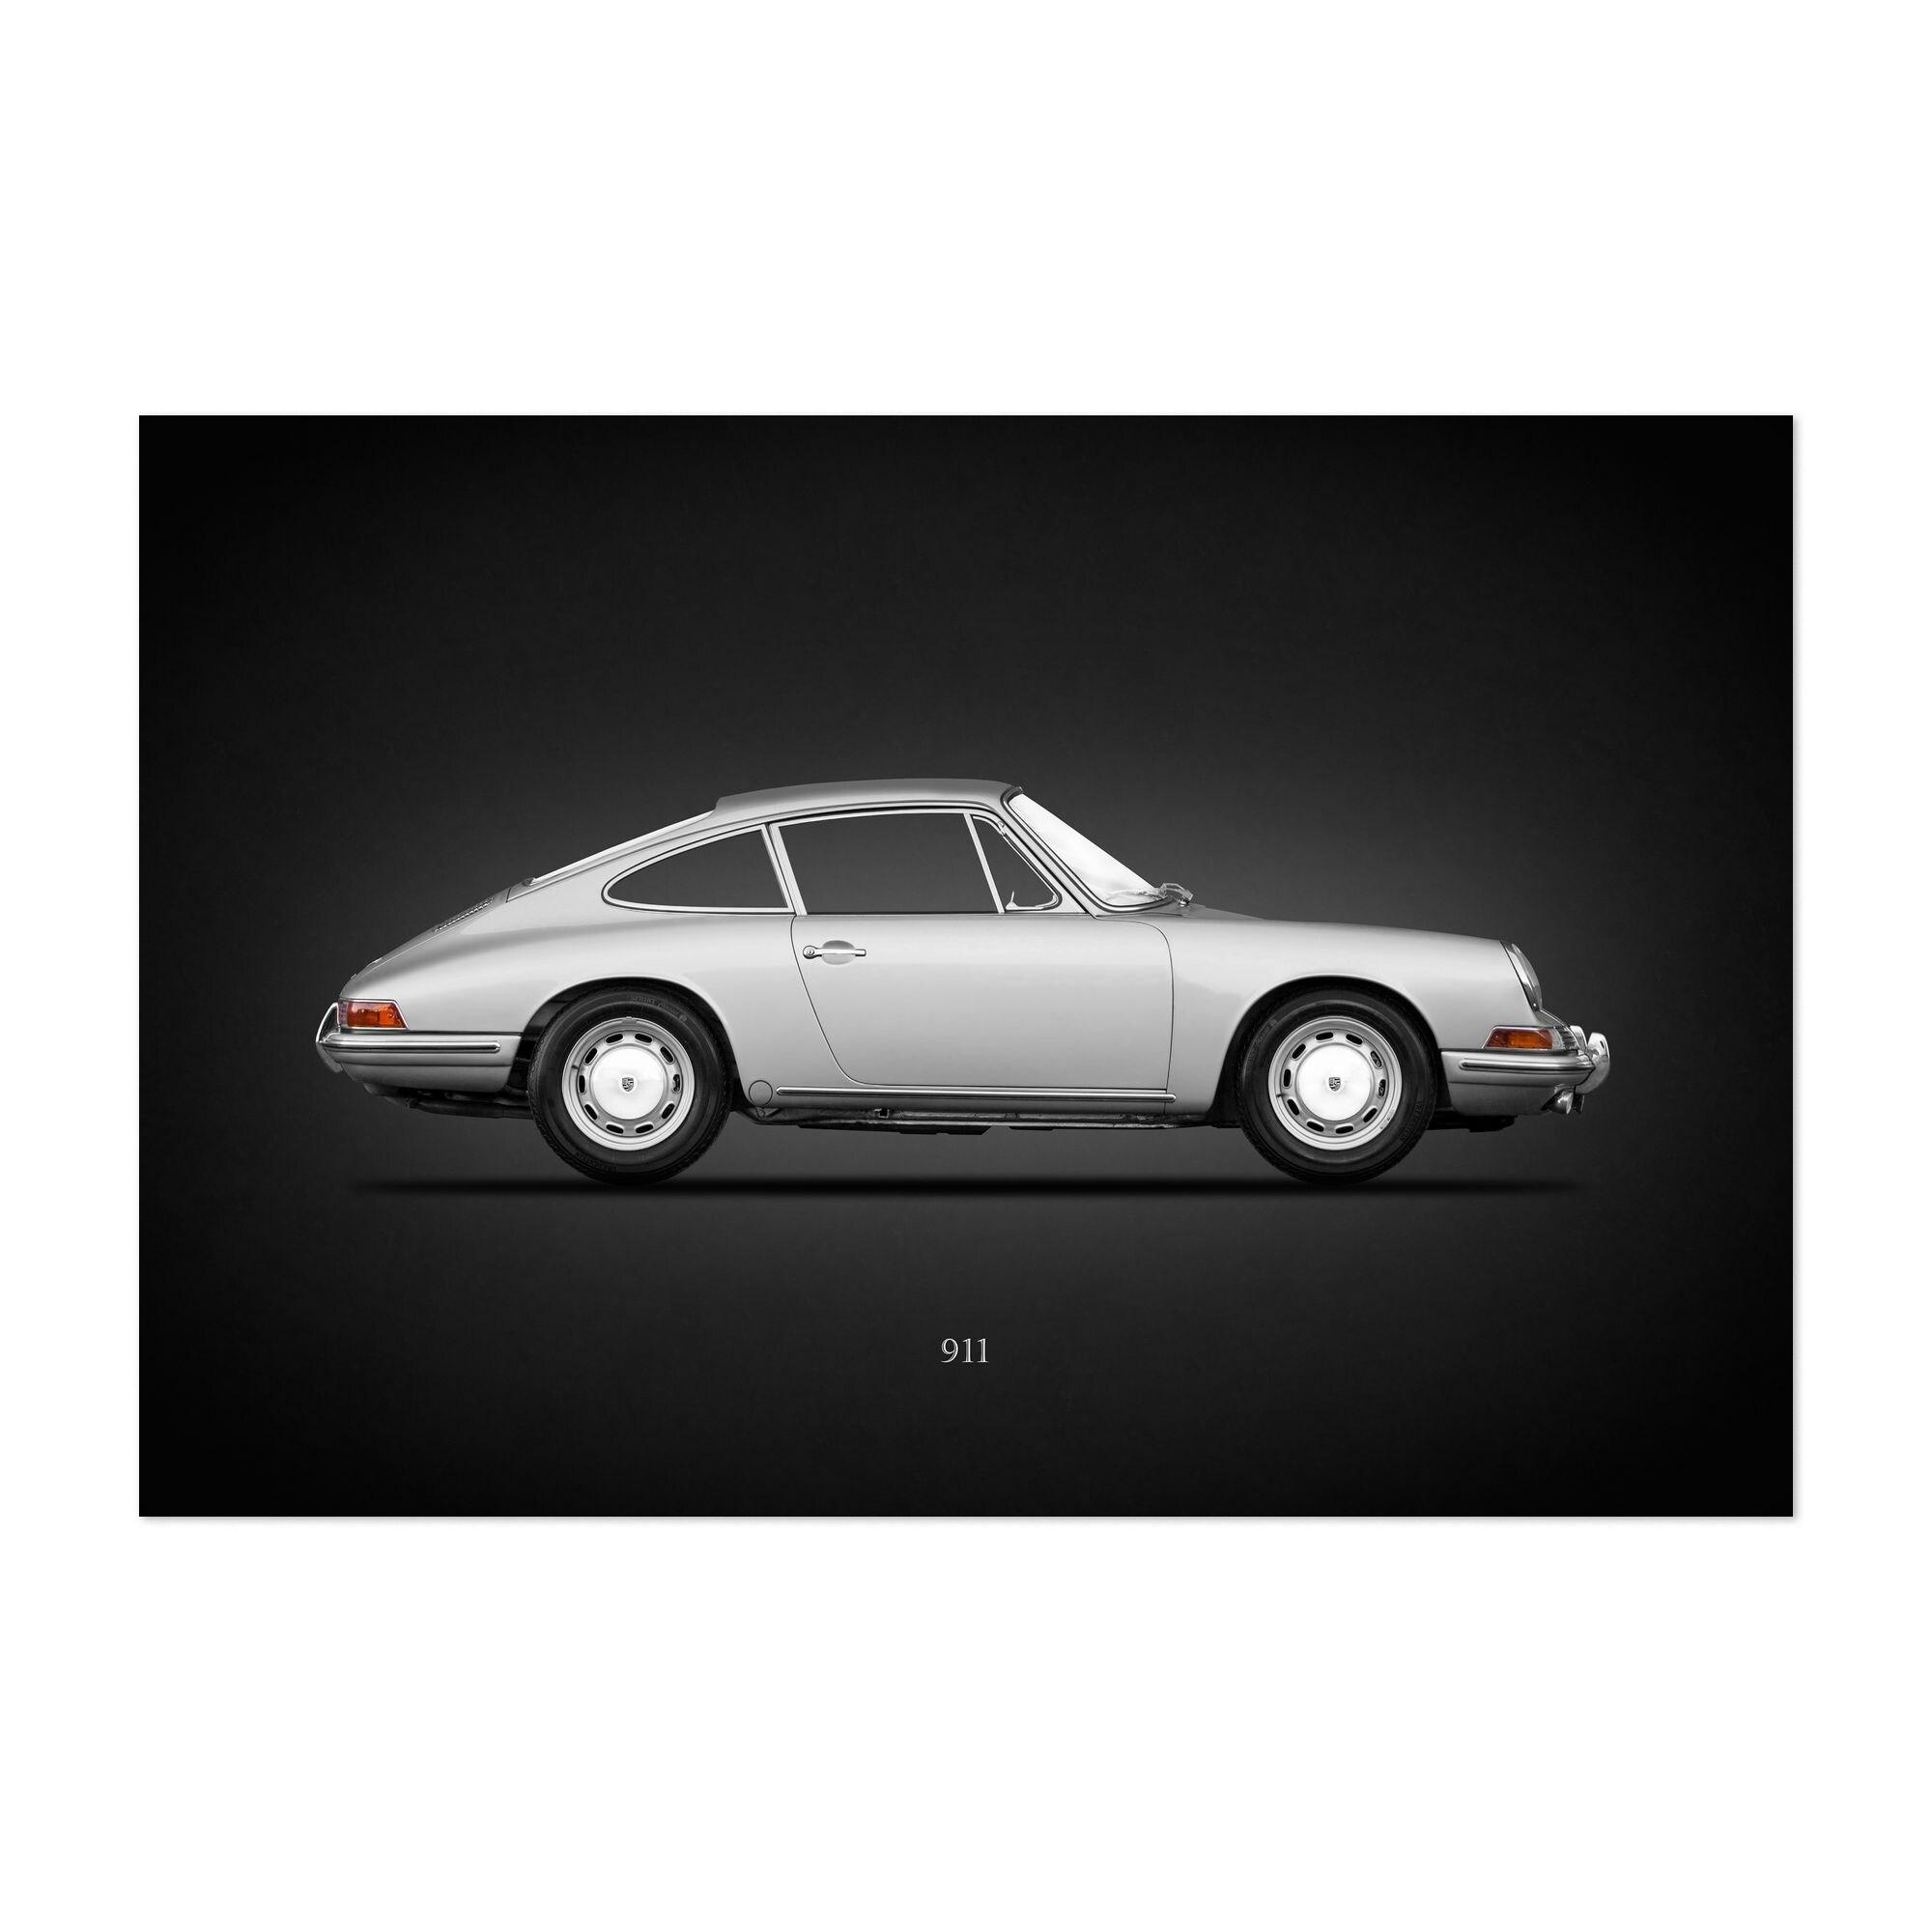 Porsche Black And White Car Poster Canvas Print Art Home Decor Wall Art Fifasteluce Com